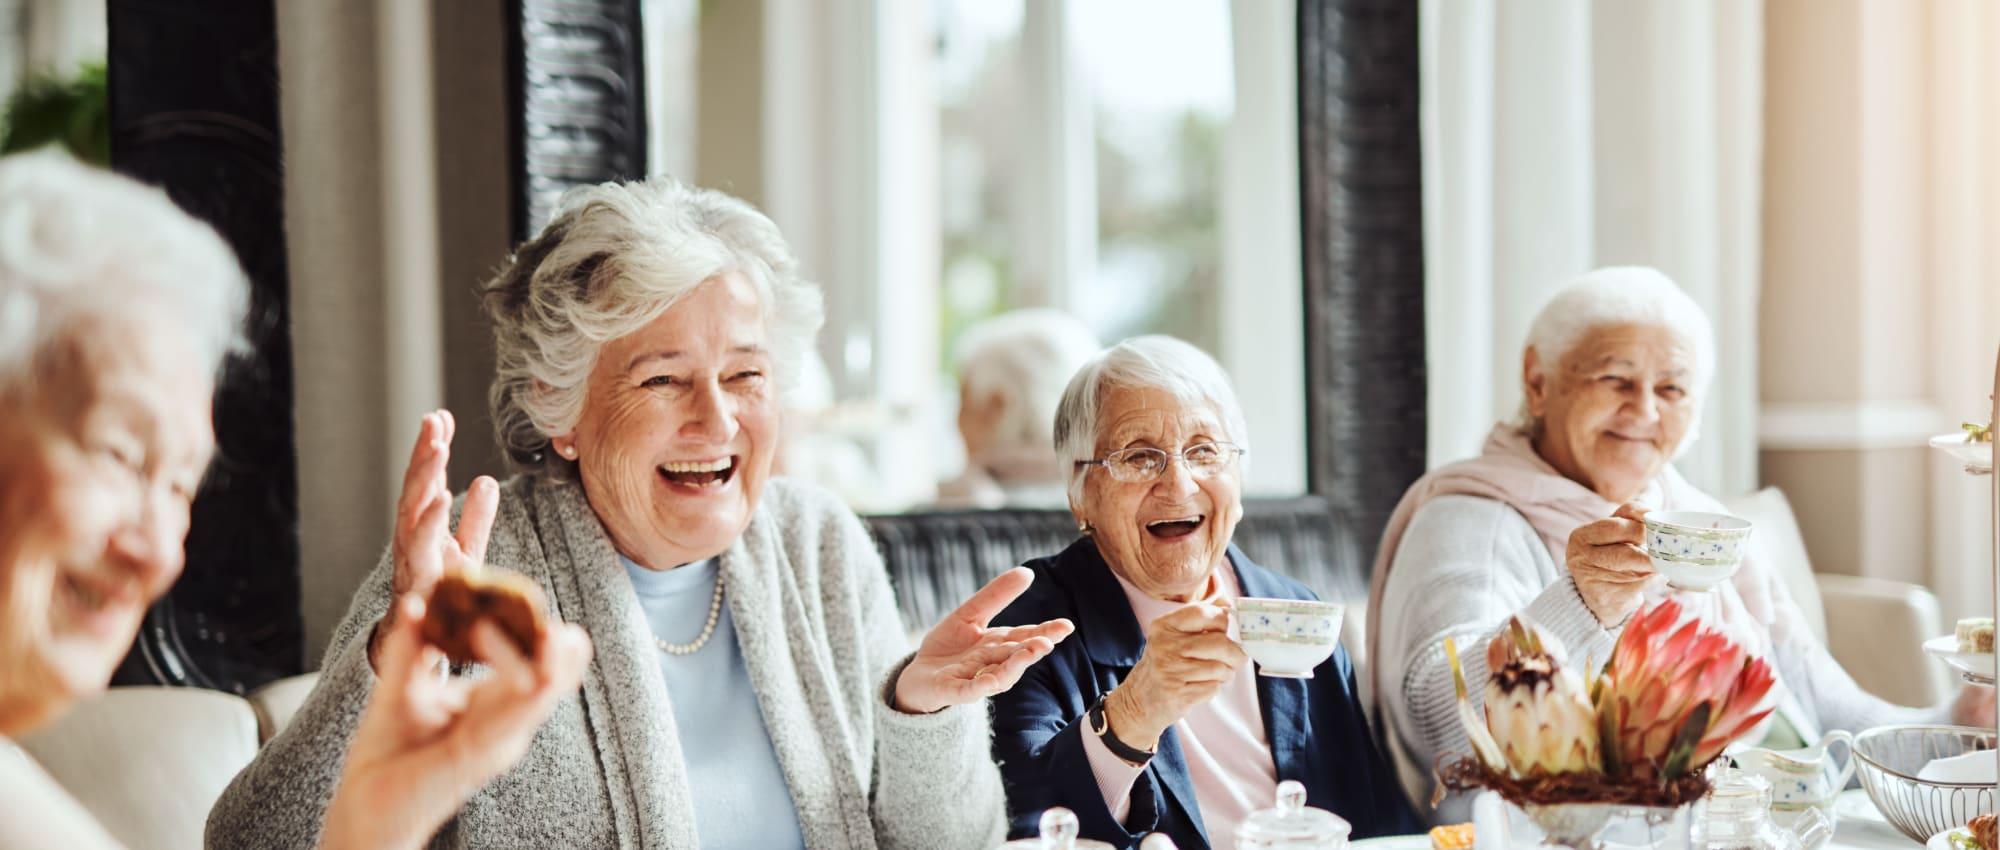 Services and amenities at Milestone Senior Living in Hillsboro, Wisconsin.